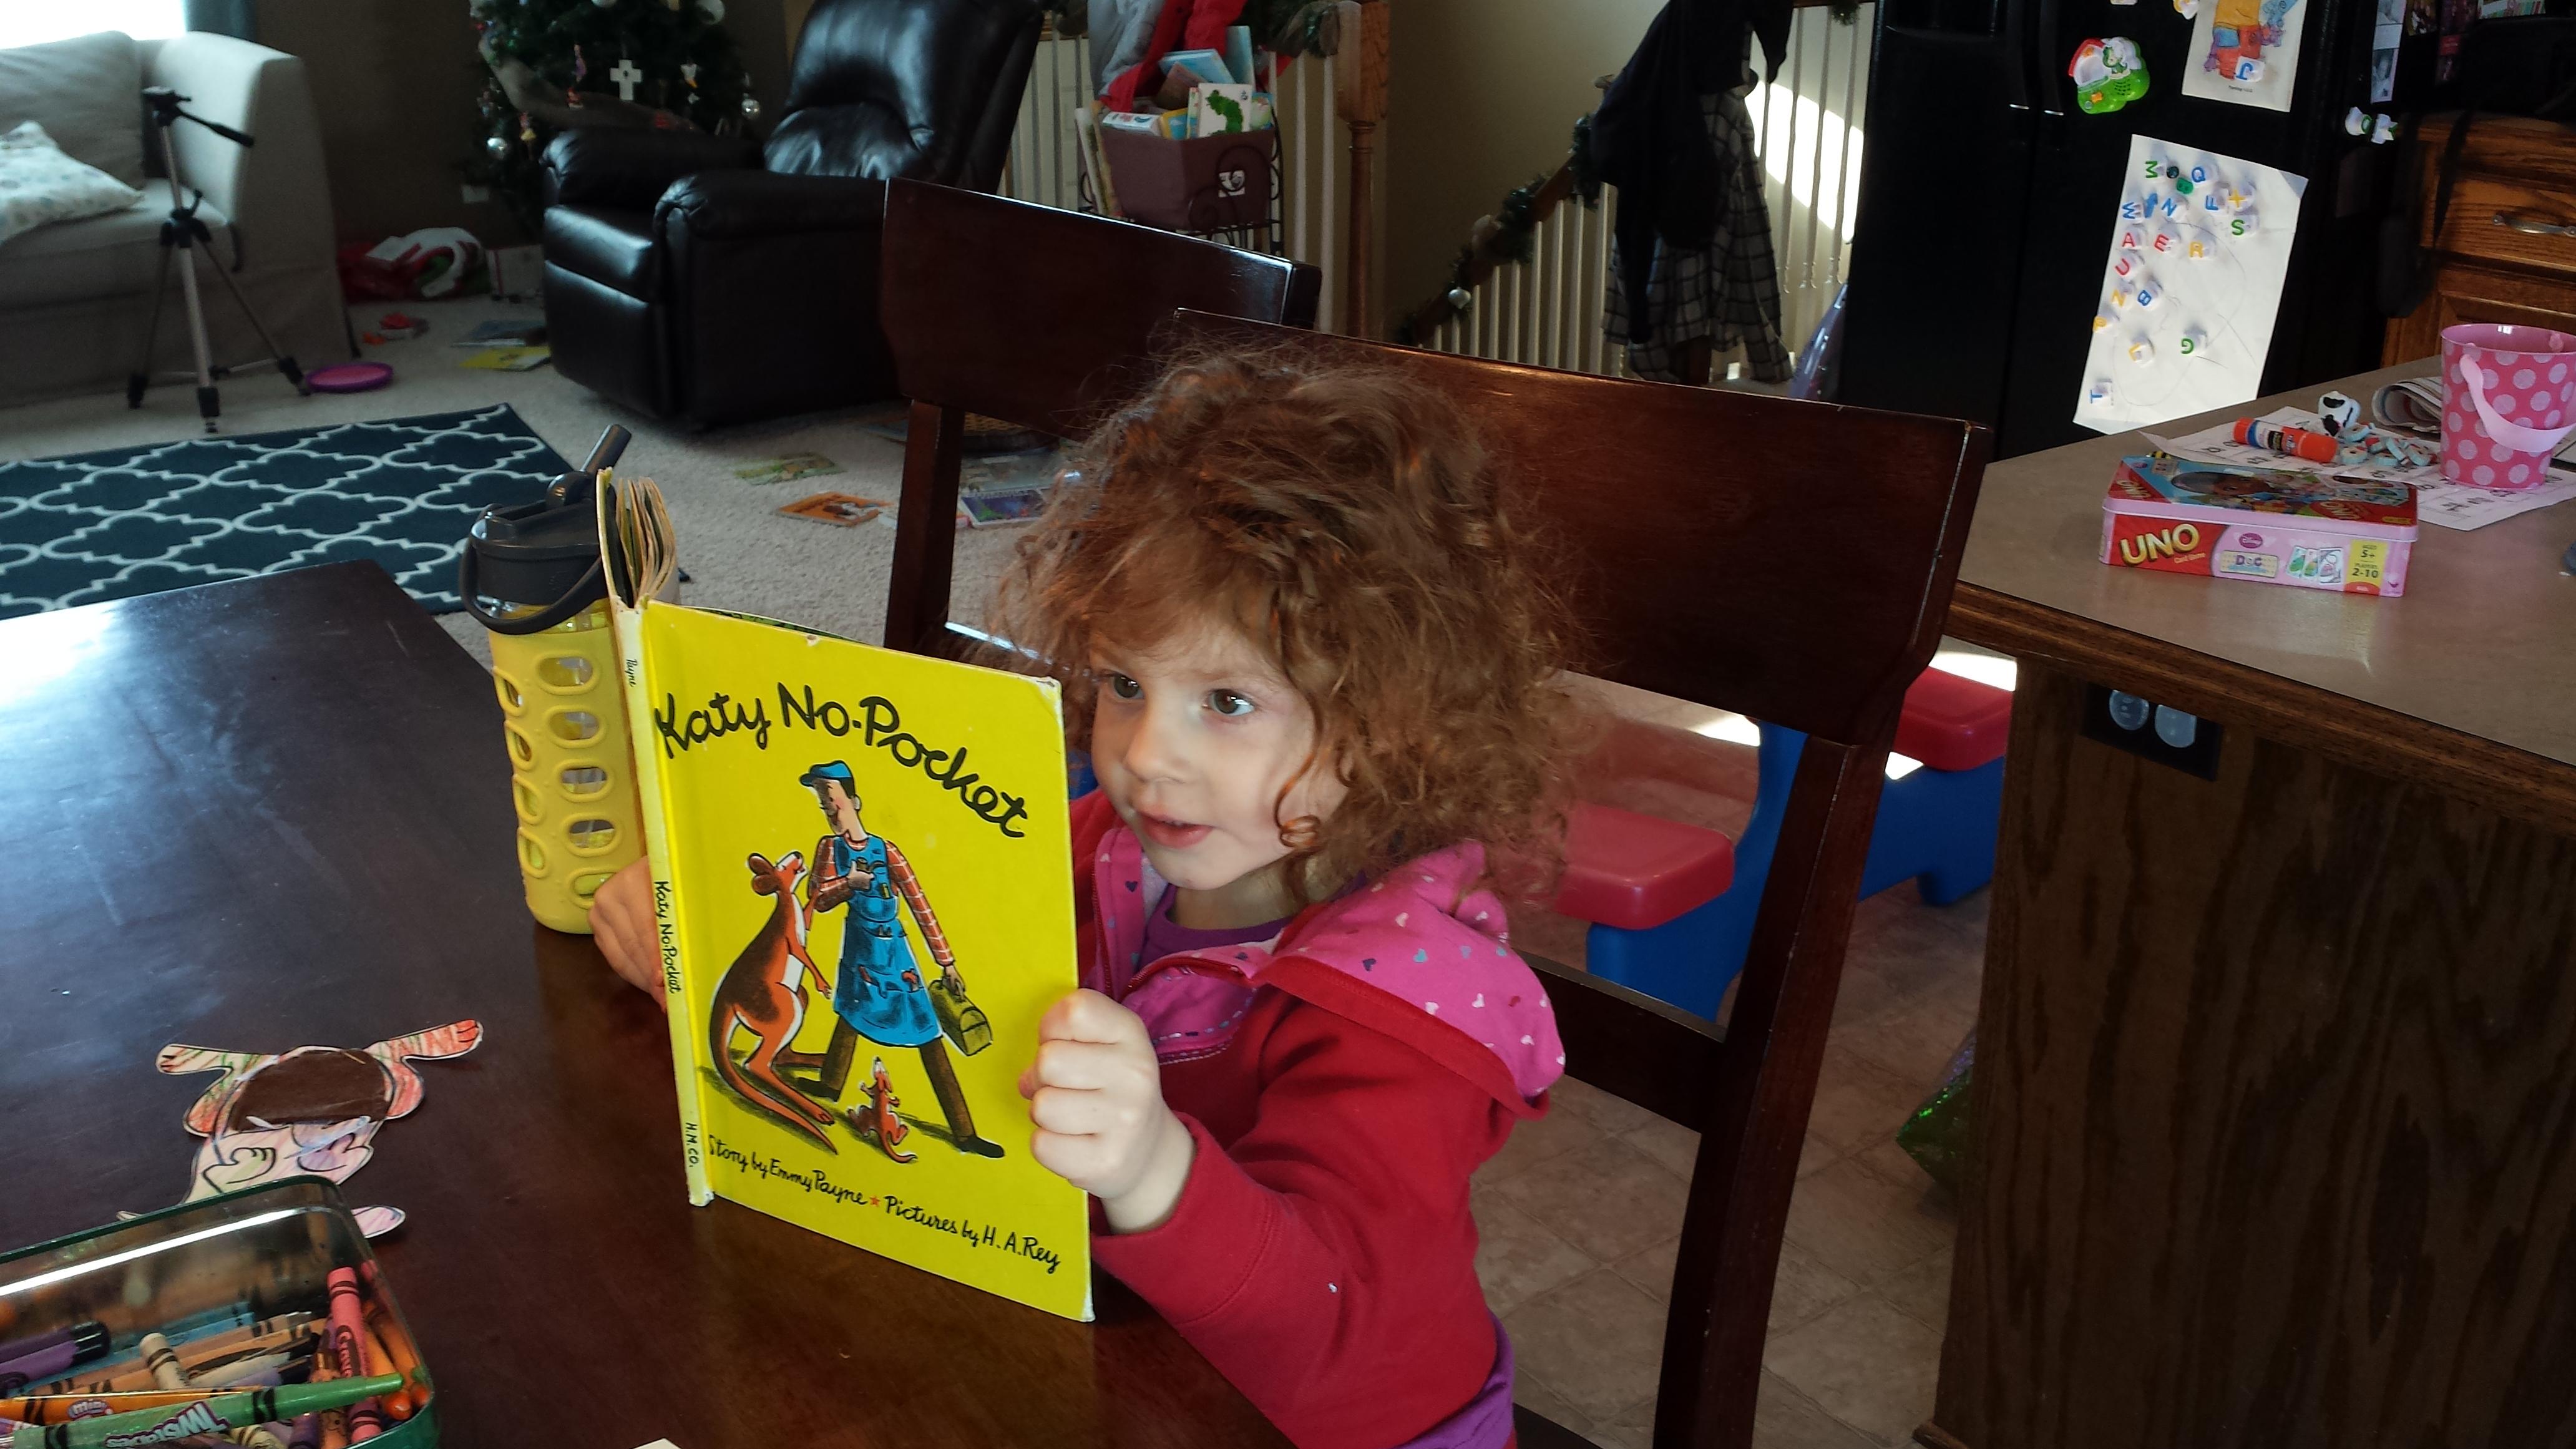 Preschool Letter K Katy No Pockets